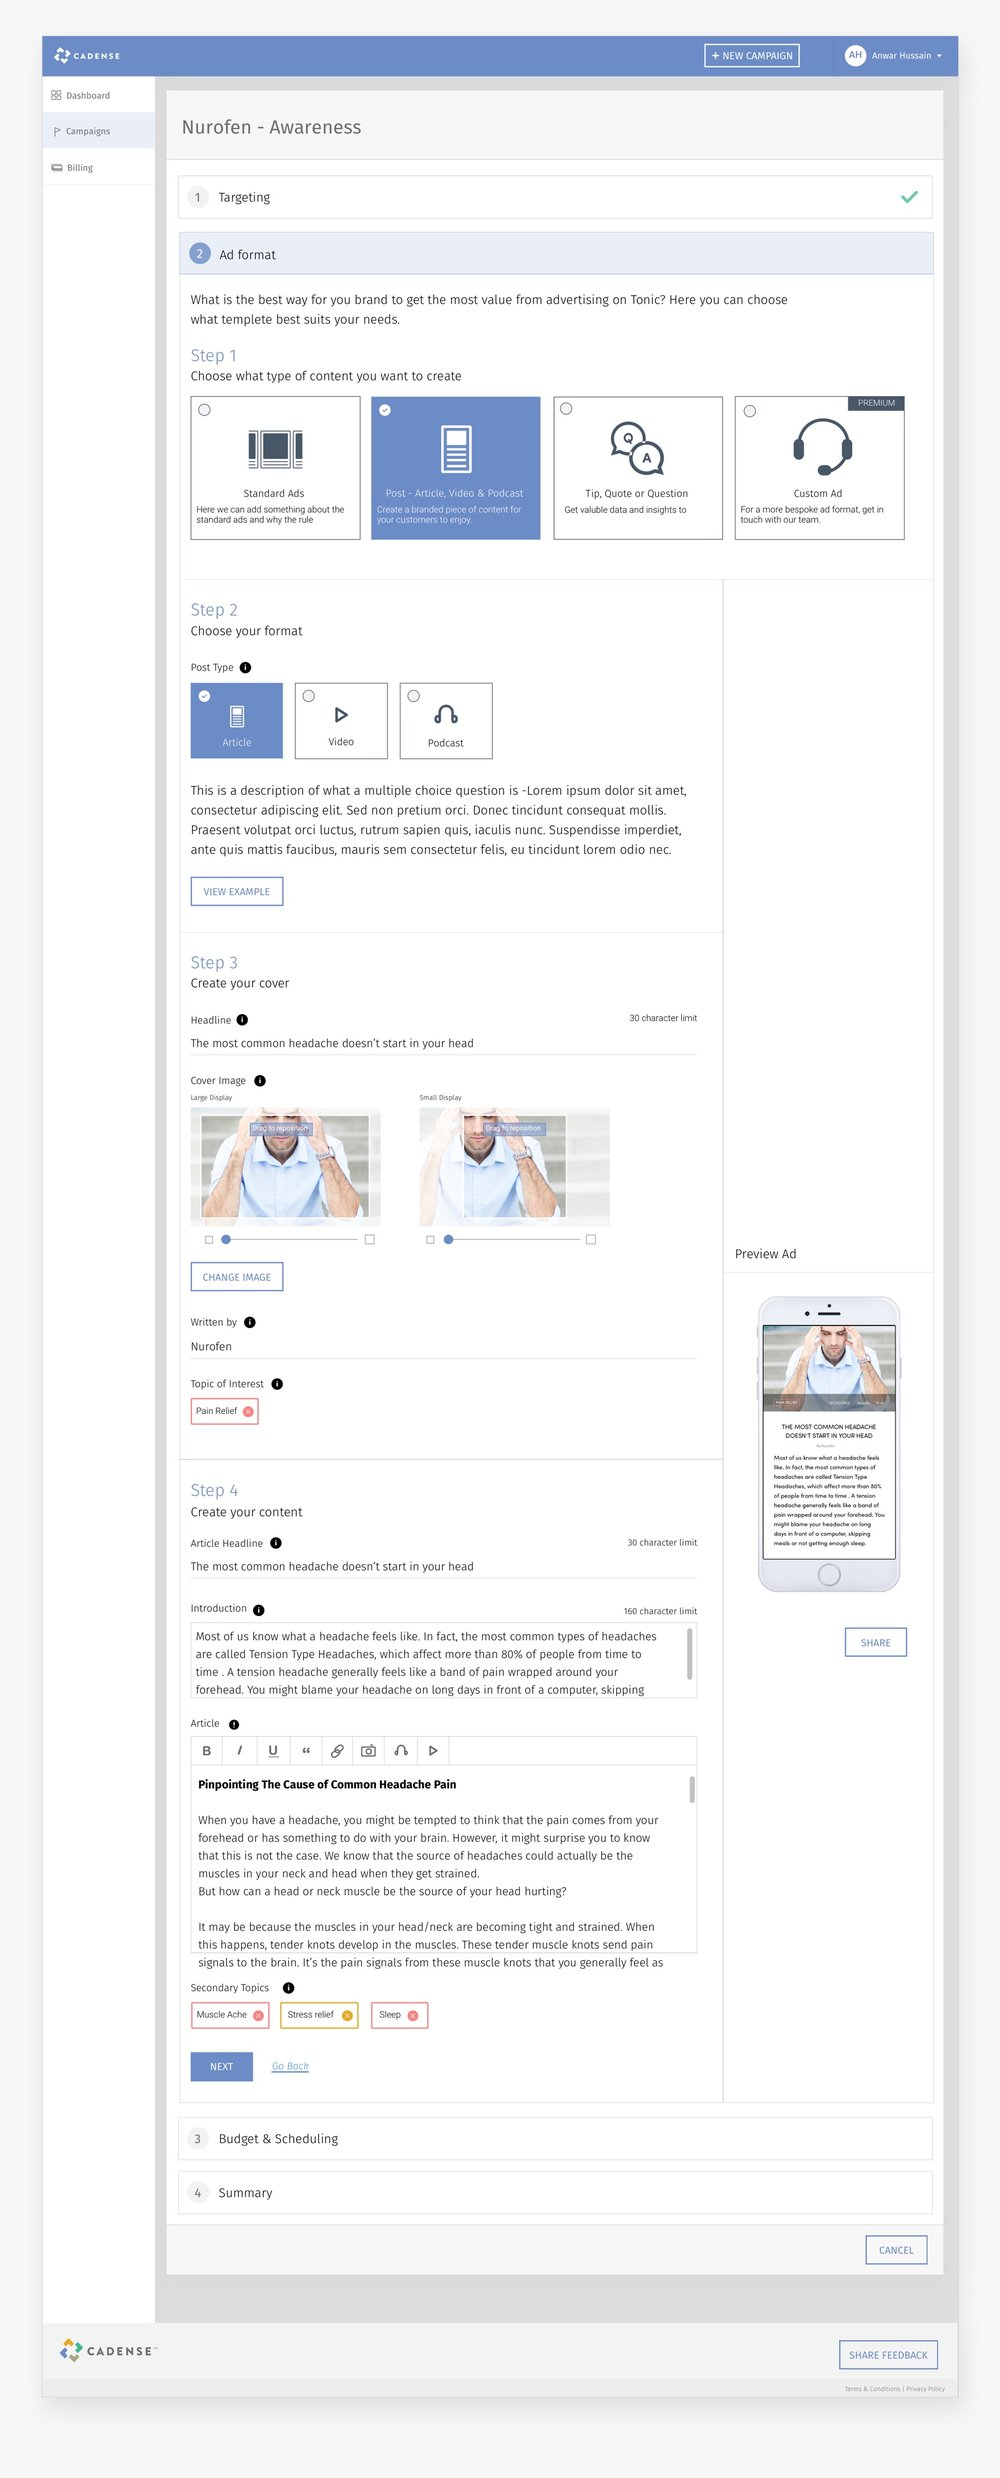 Tonic-Cadense-marketing-page-design-furtnermore-studio Copy 2.jpg